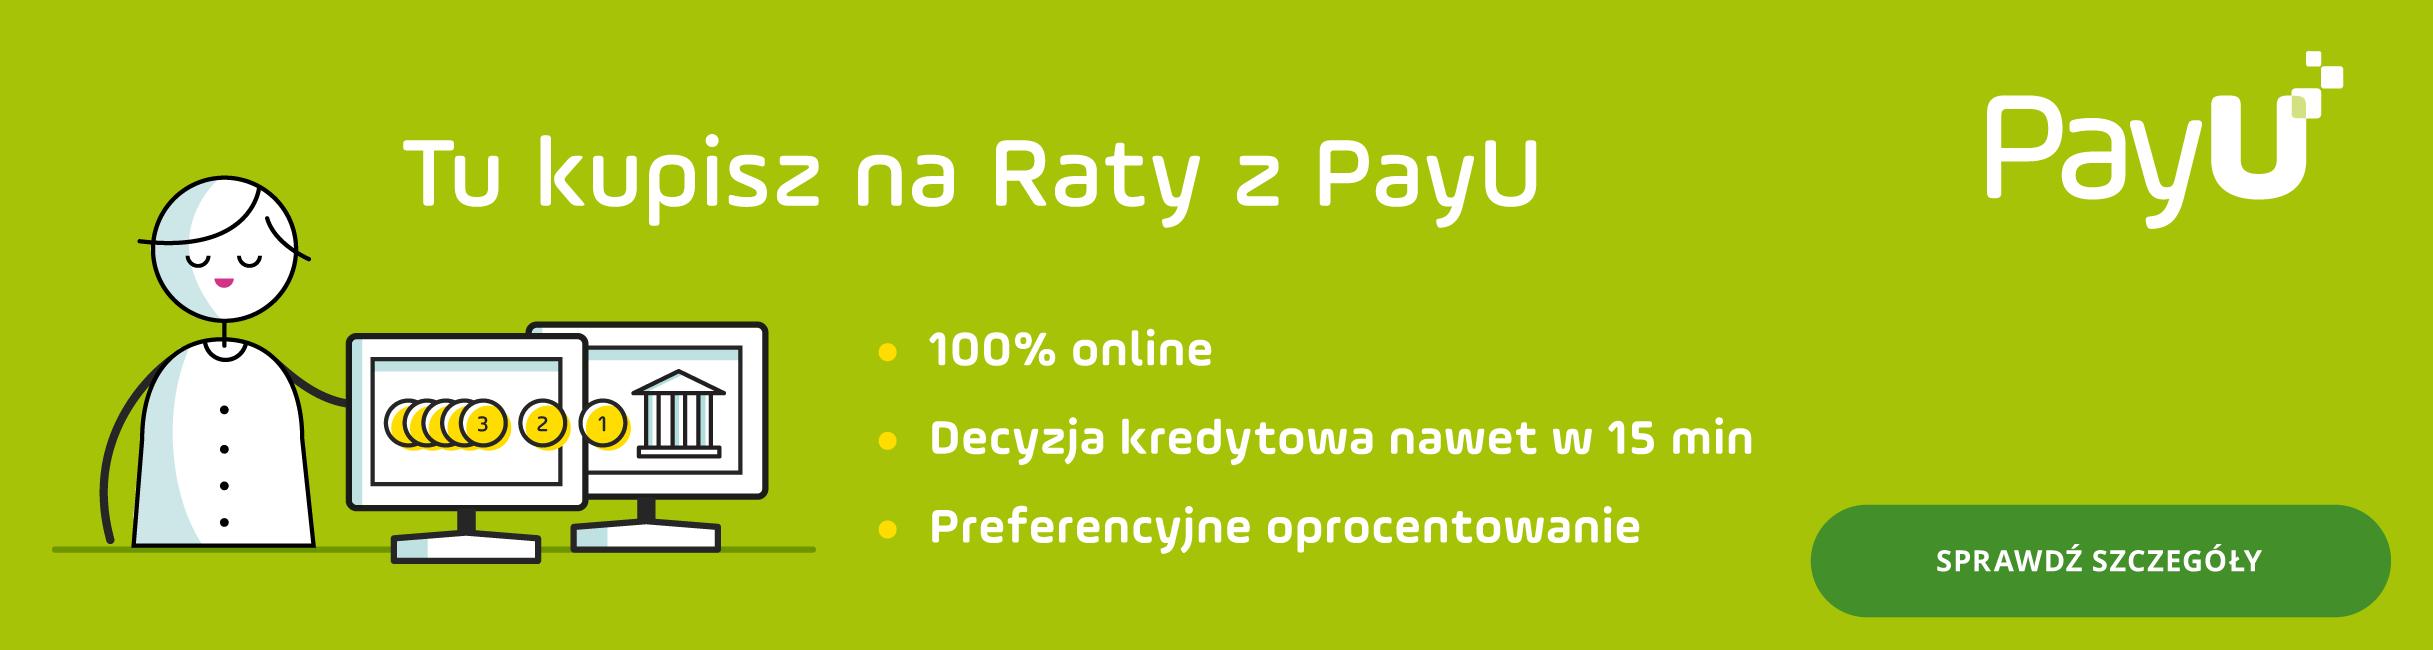 Tu_kupisz_na_raty_baner.png